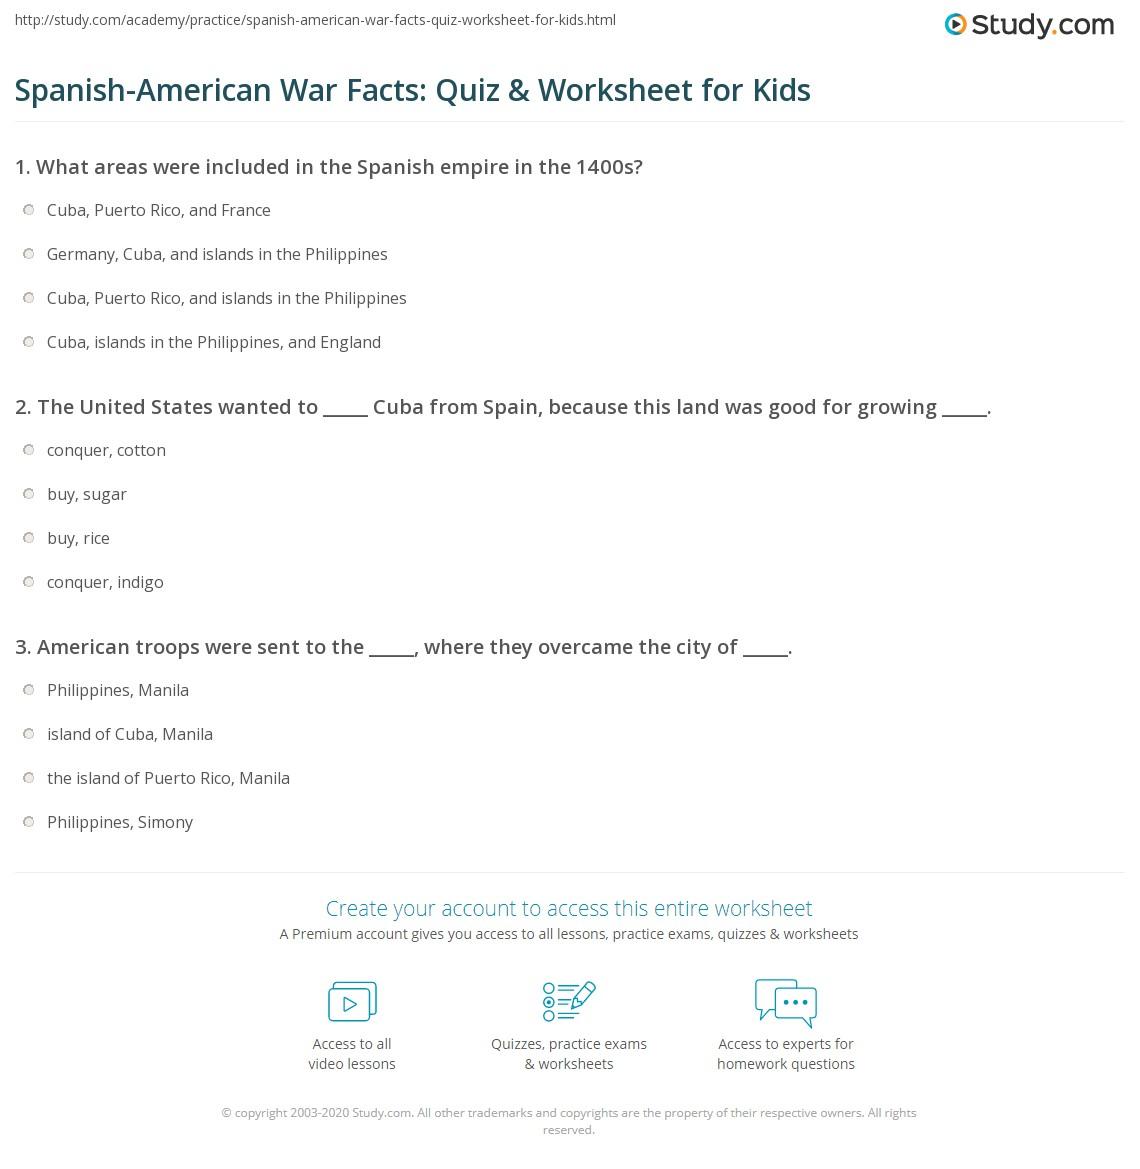 worksheet Spanish American War Worksheet spanish american war facts quiz worksheet for kids study com print lesson causes summary worksheet